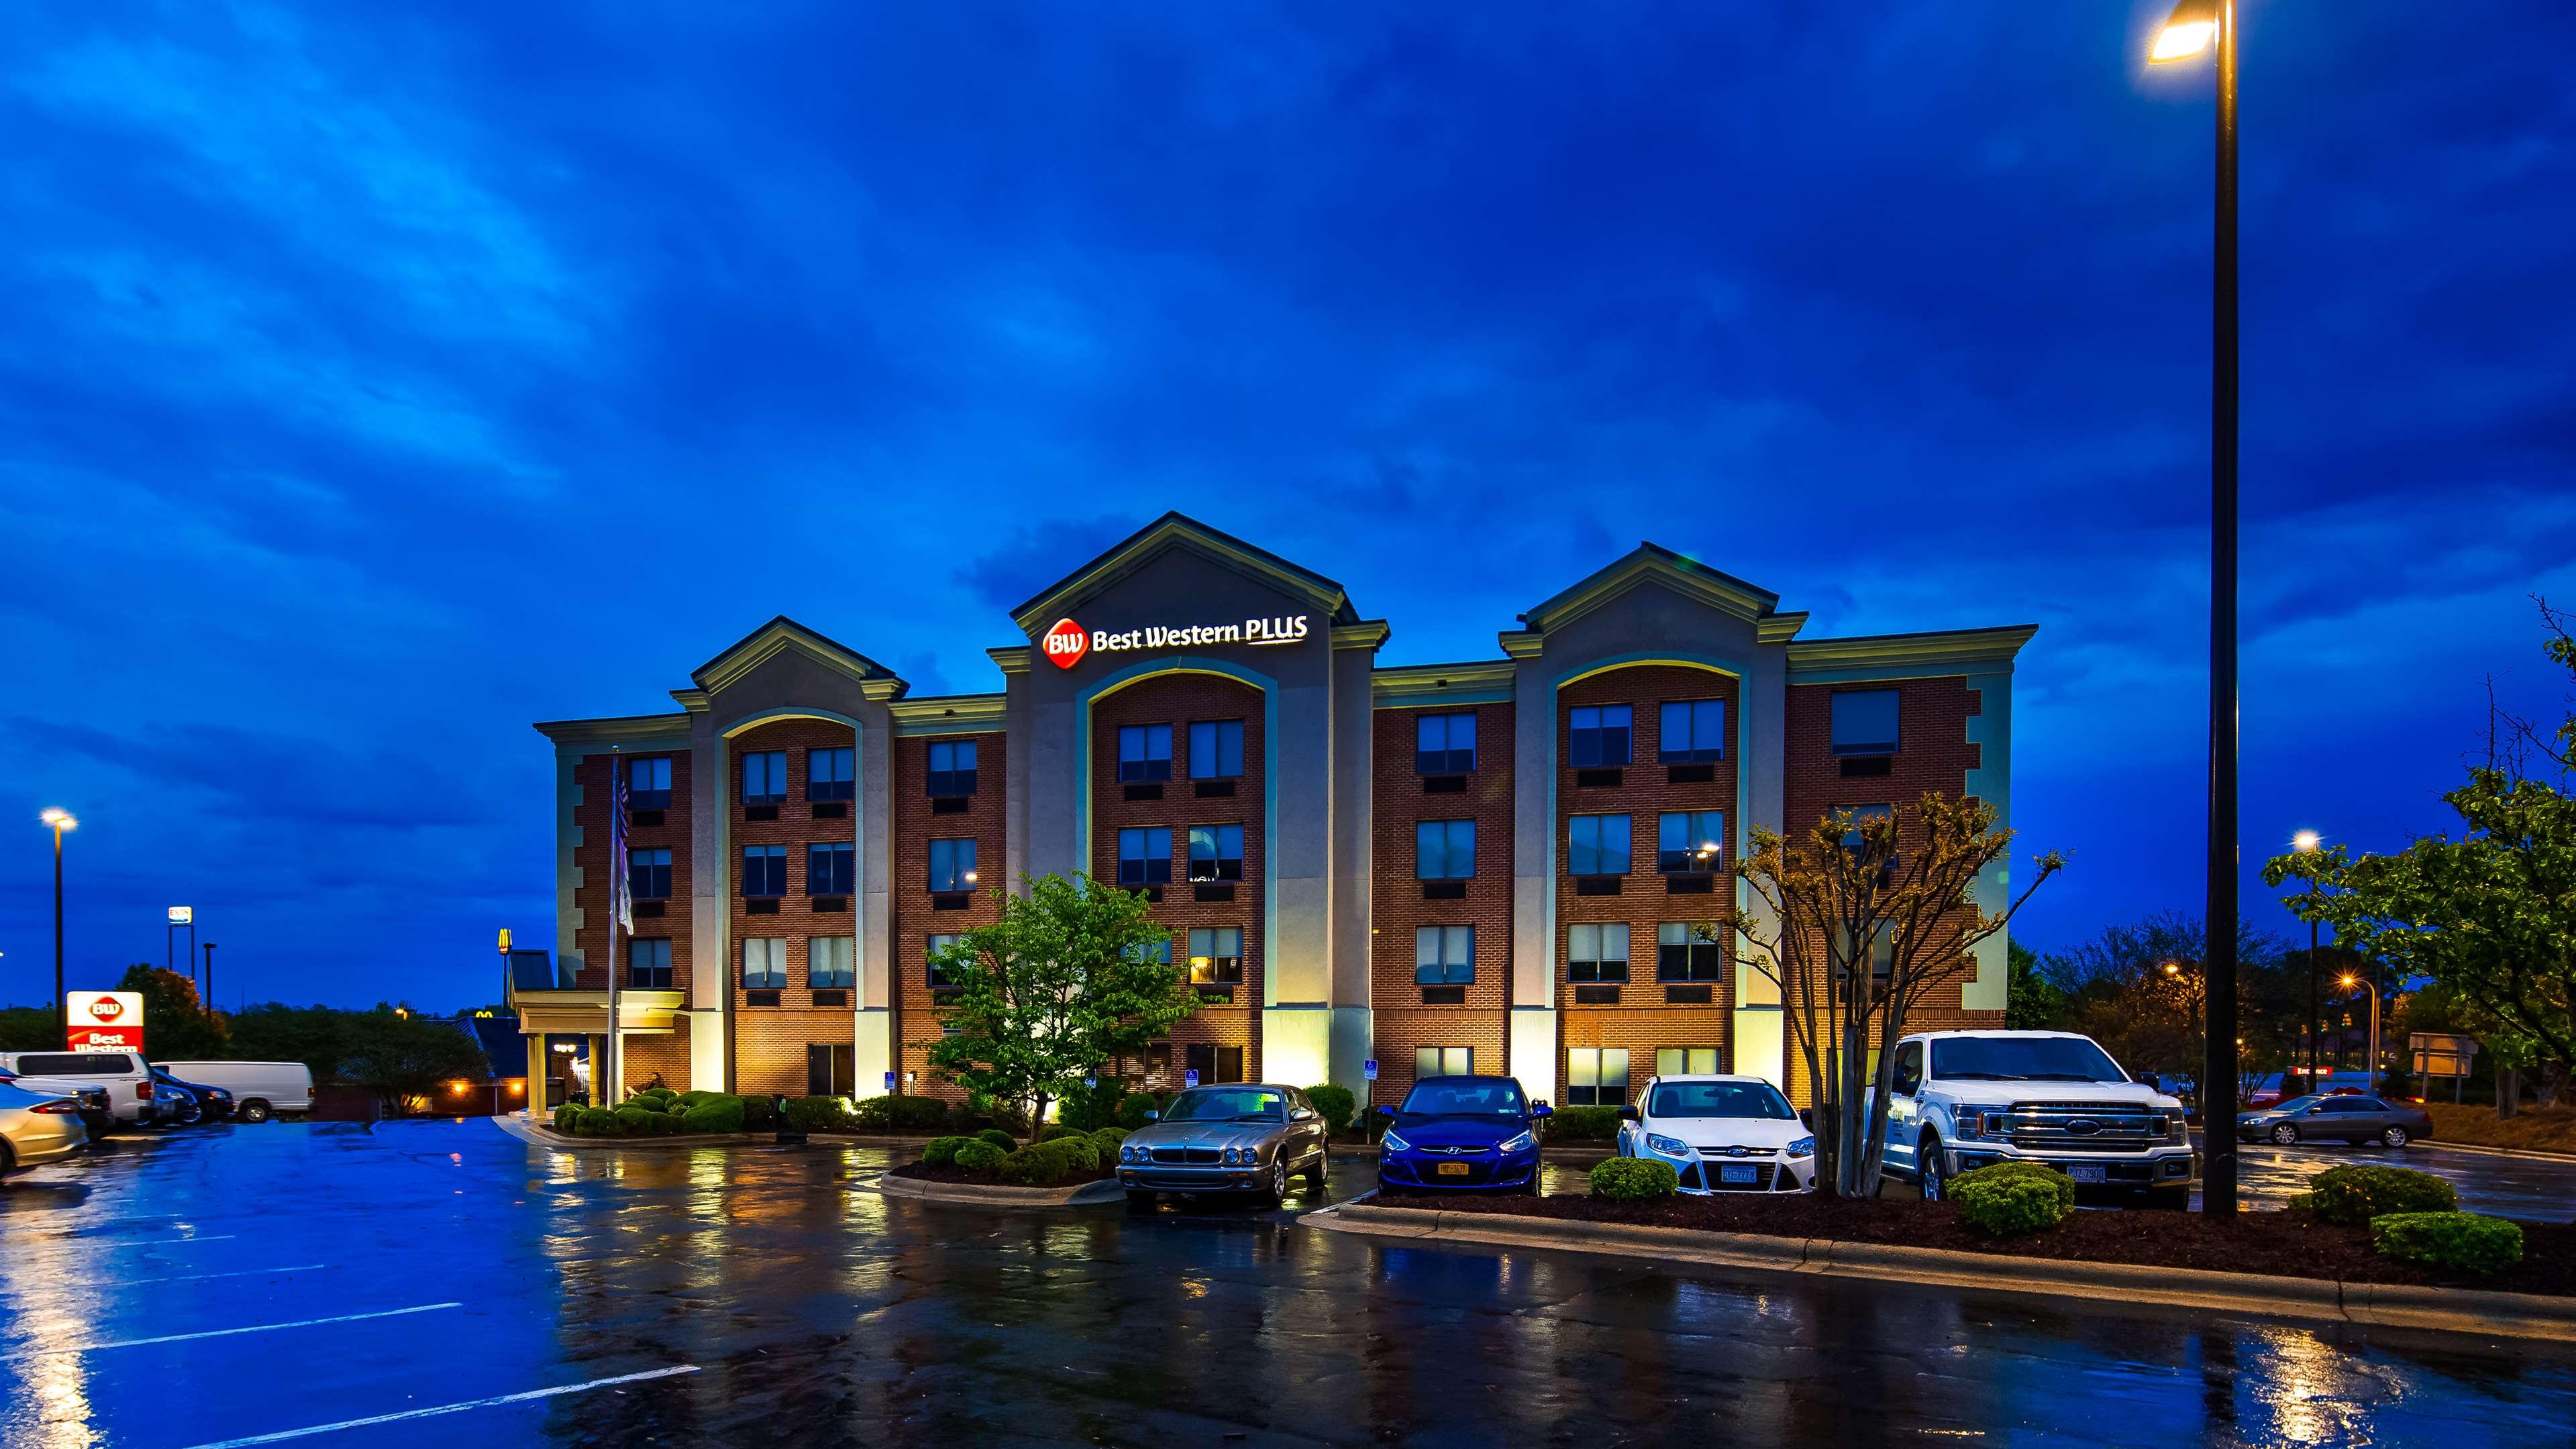 Best Western Plus Greensboro Airport Hotel image 2